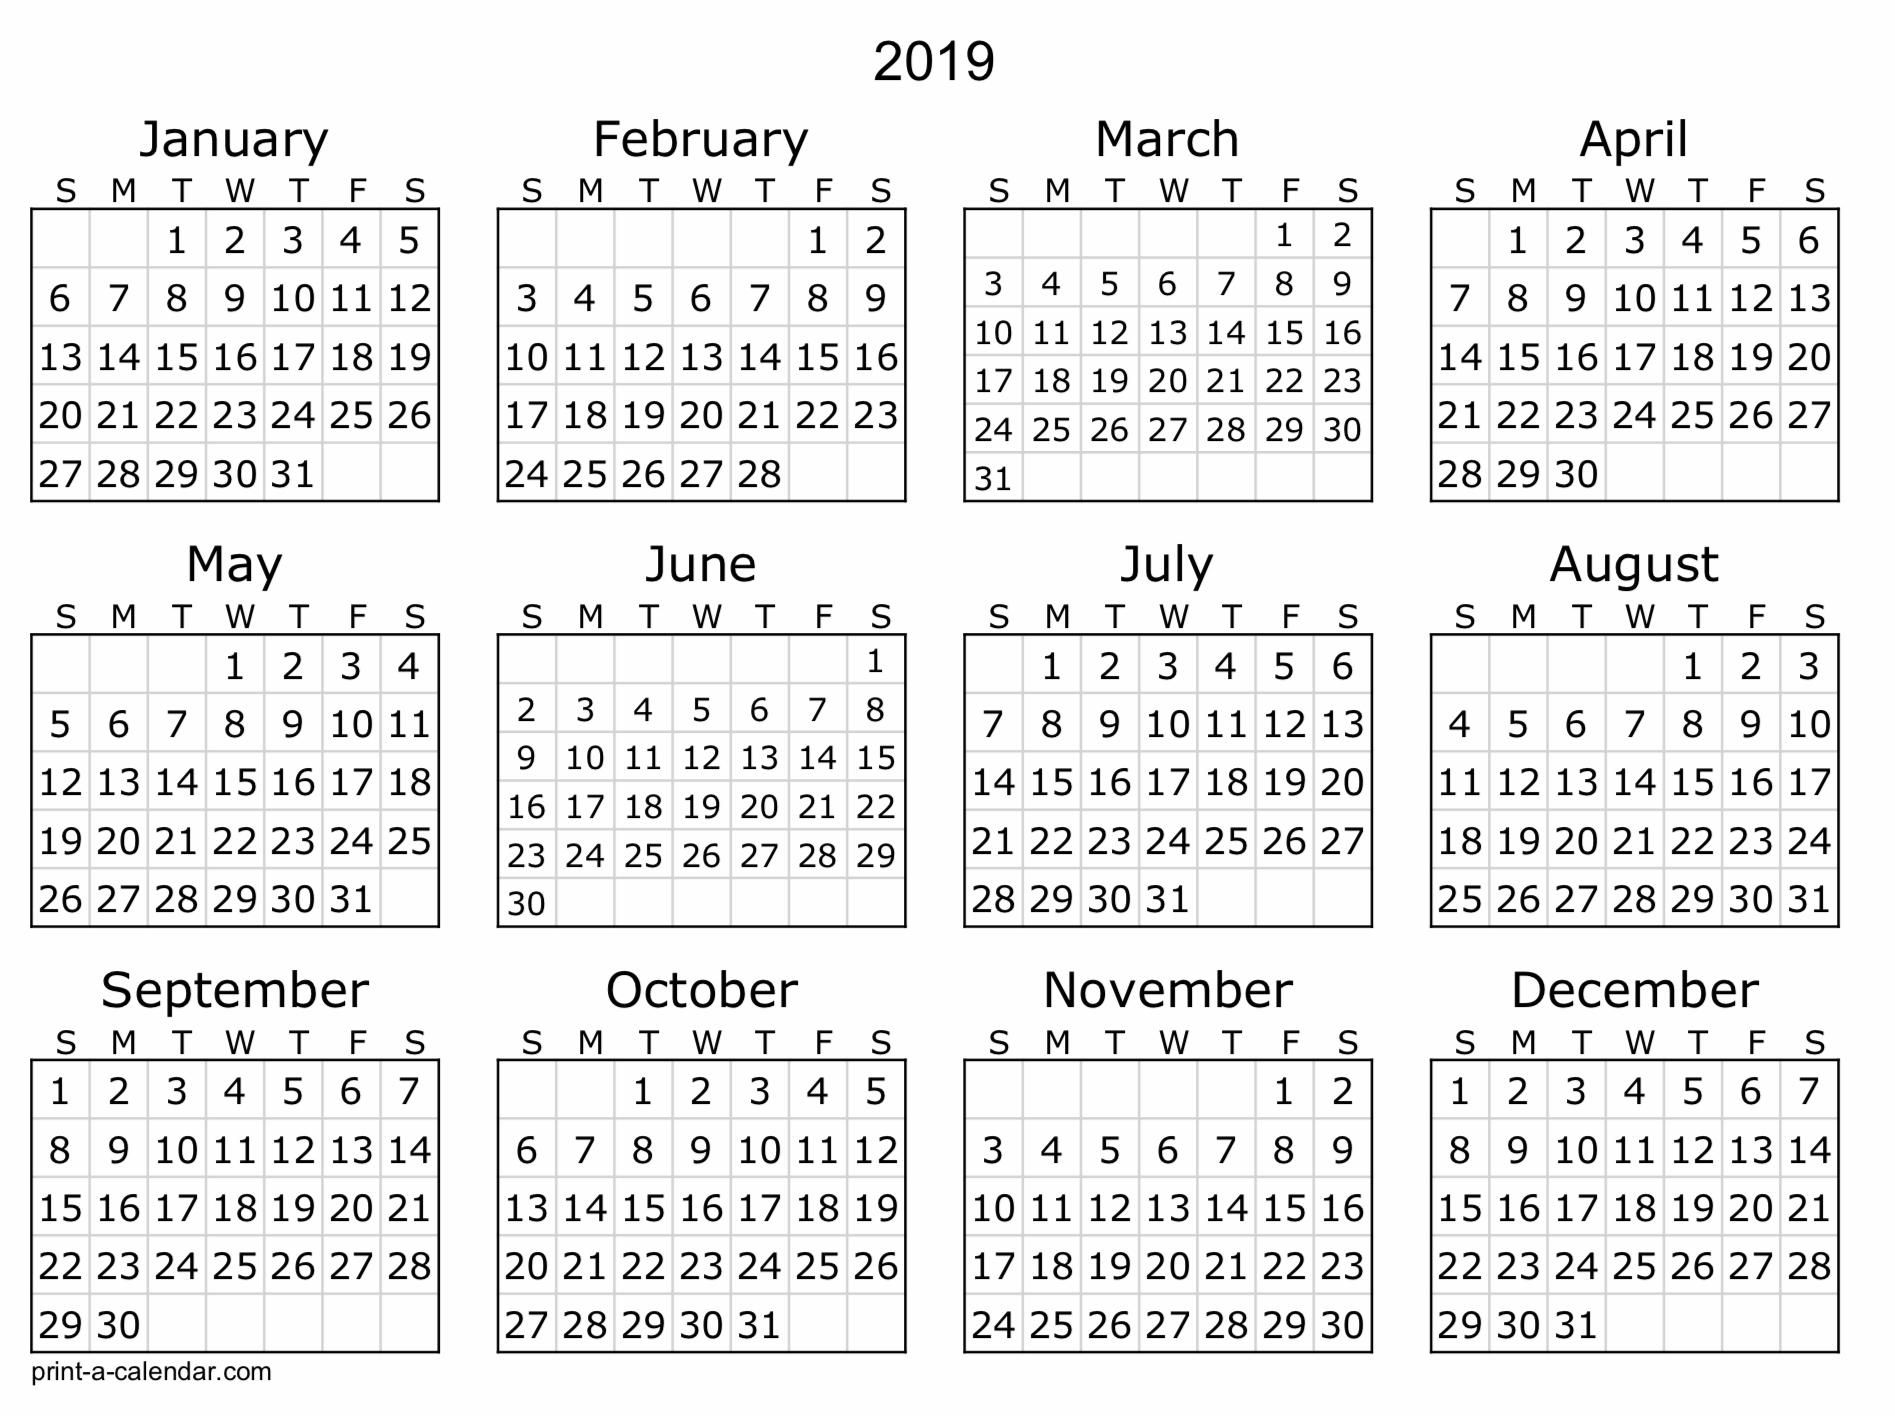 2019 Free Printable Calendar Templates - A Mother's Random Thoughts throughout Free Printable Calendar Templates 8 X 10